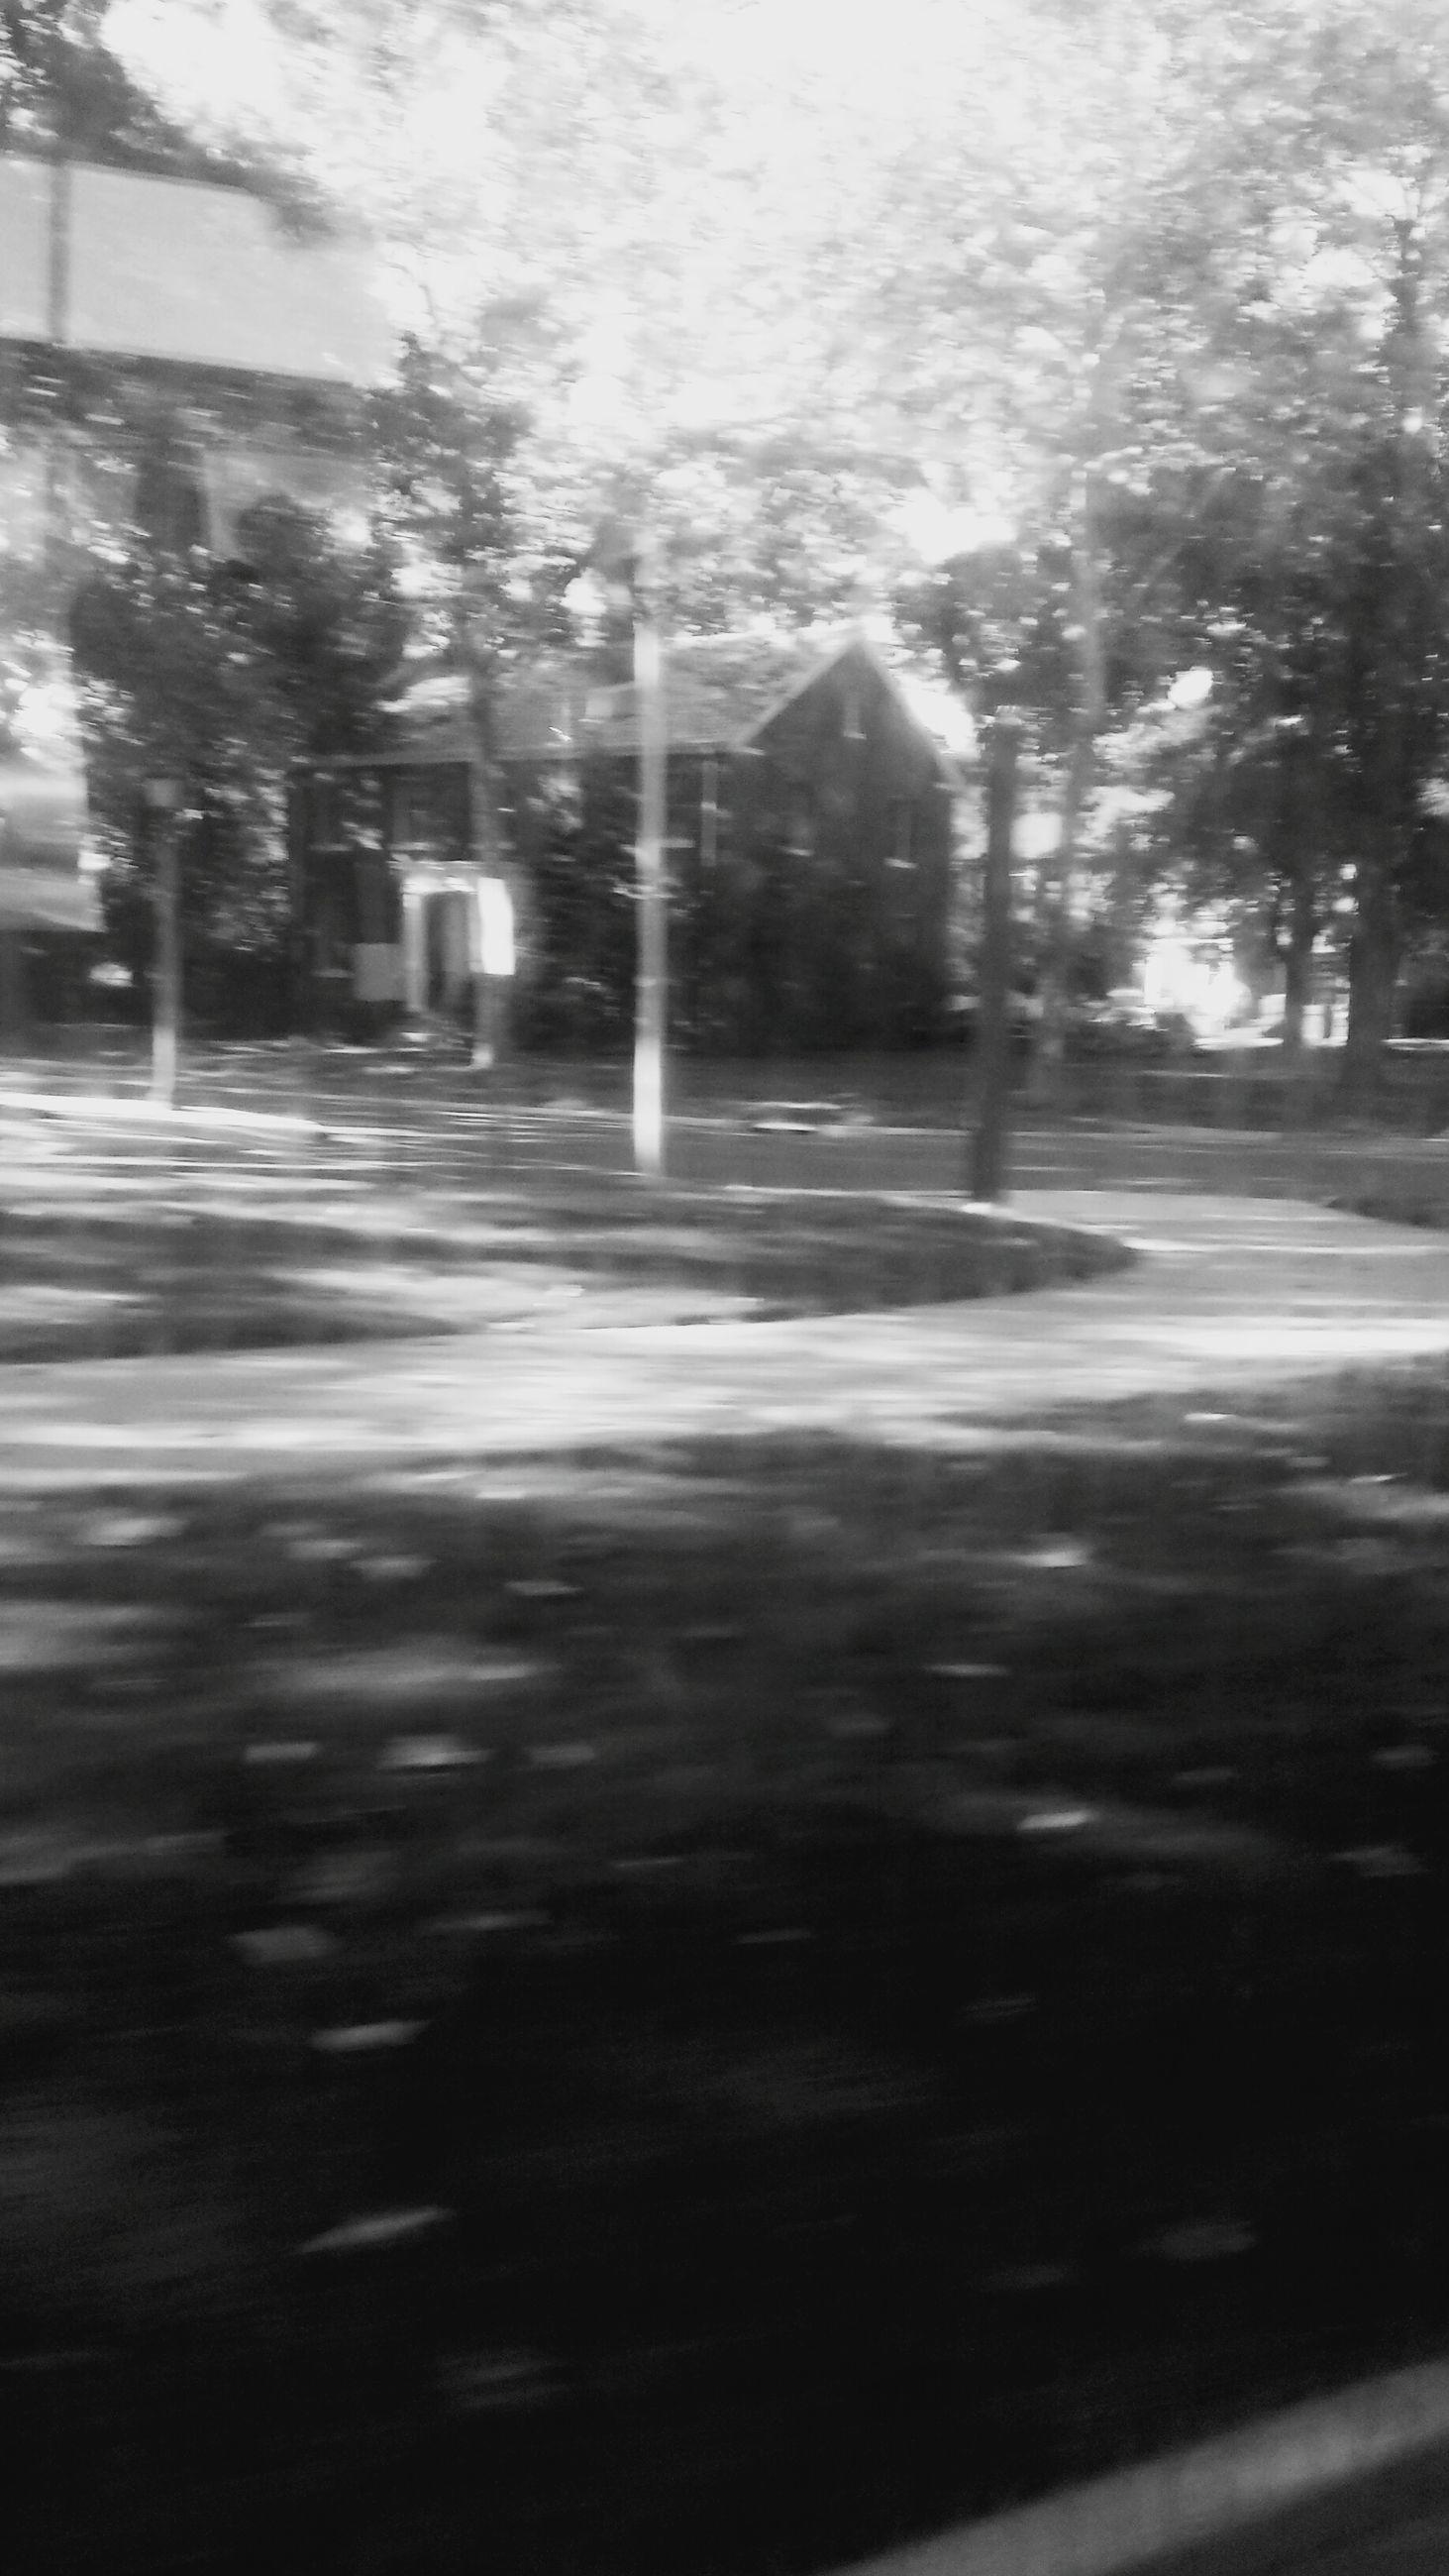 transportation, road, street, the way forward, car, tree, land vehicle, wet, motion, road marking, street light, rain, mode of transport, illuminated, blurred motion, night, on the move, asphalt, speed, outdoors